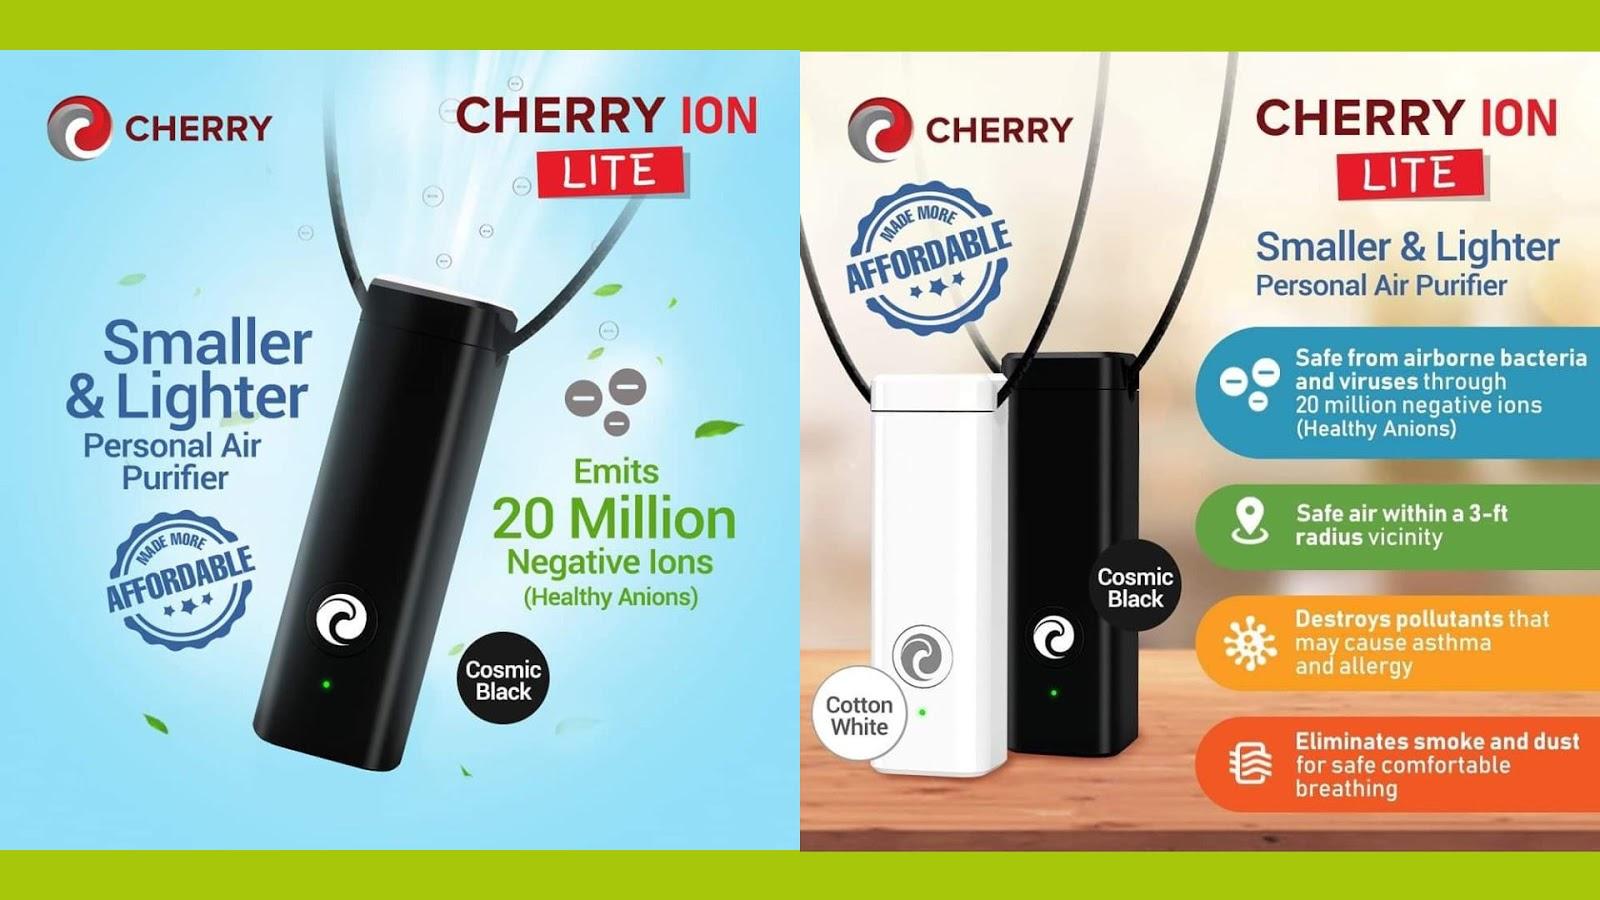 Cherry Ion Lite Ionizer Air Purifier